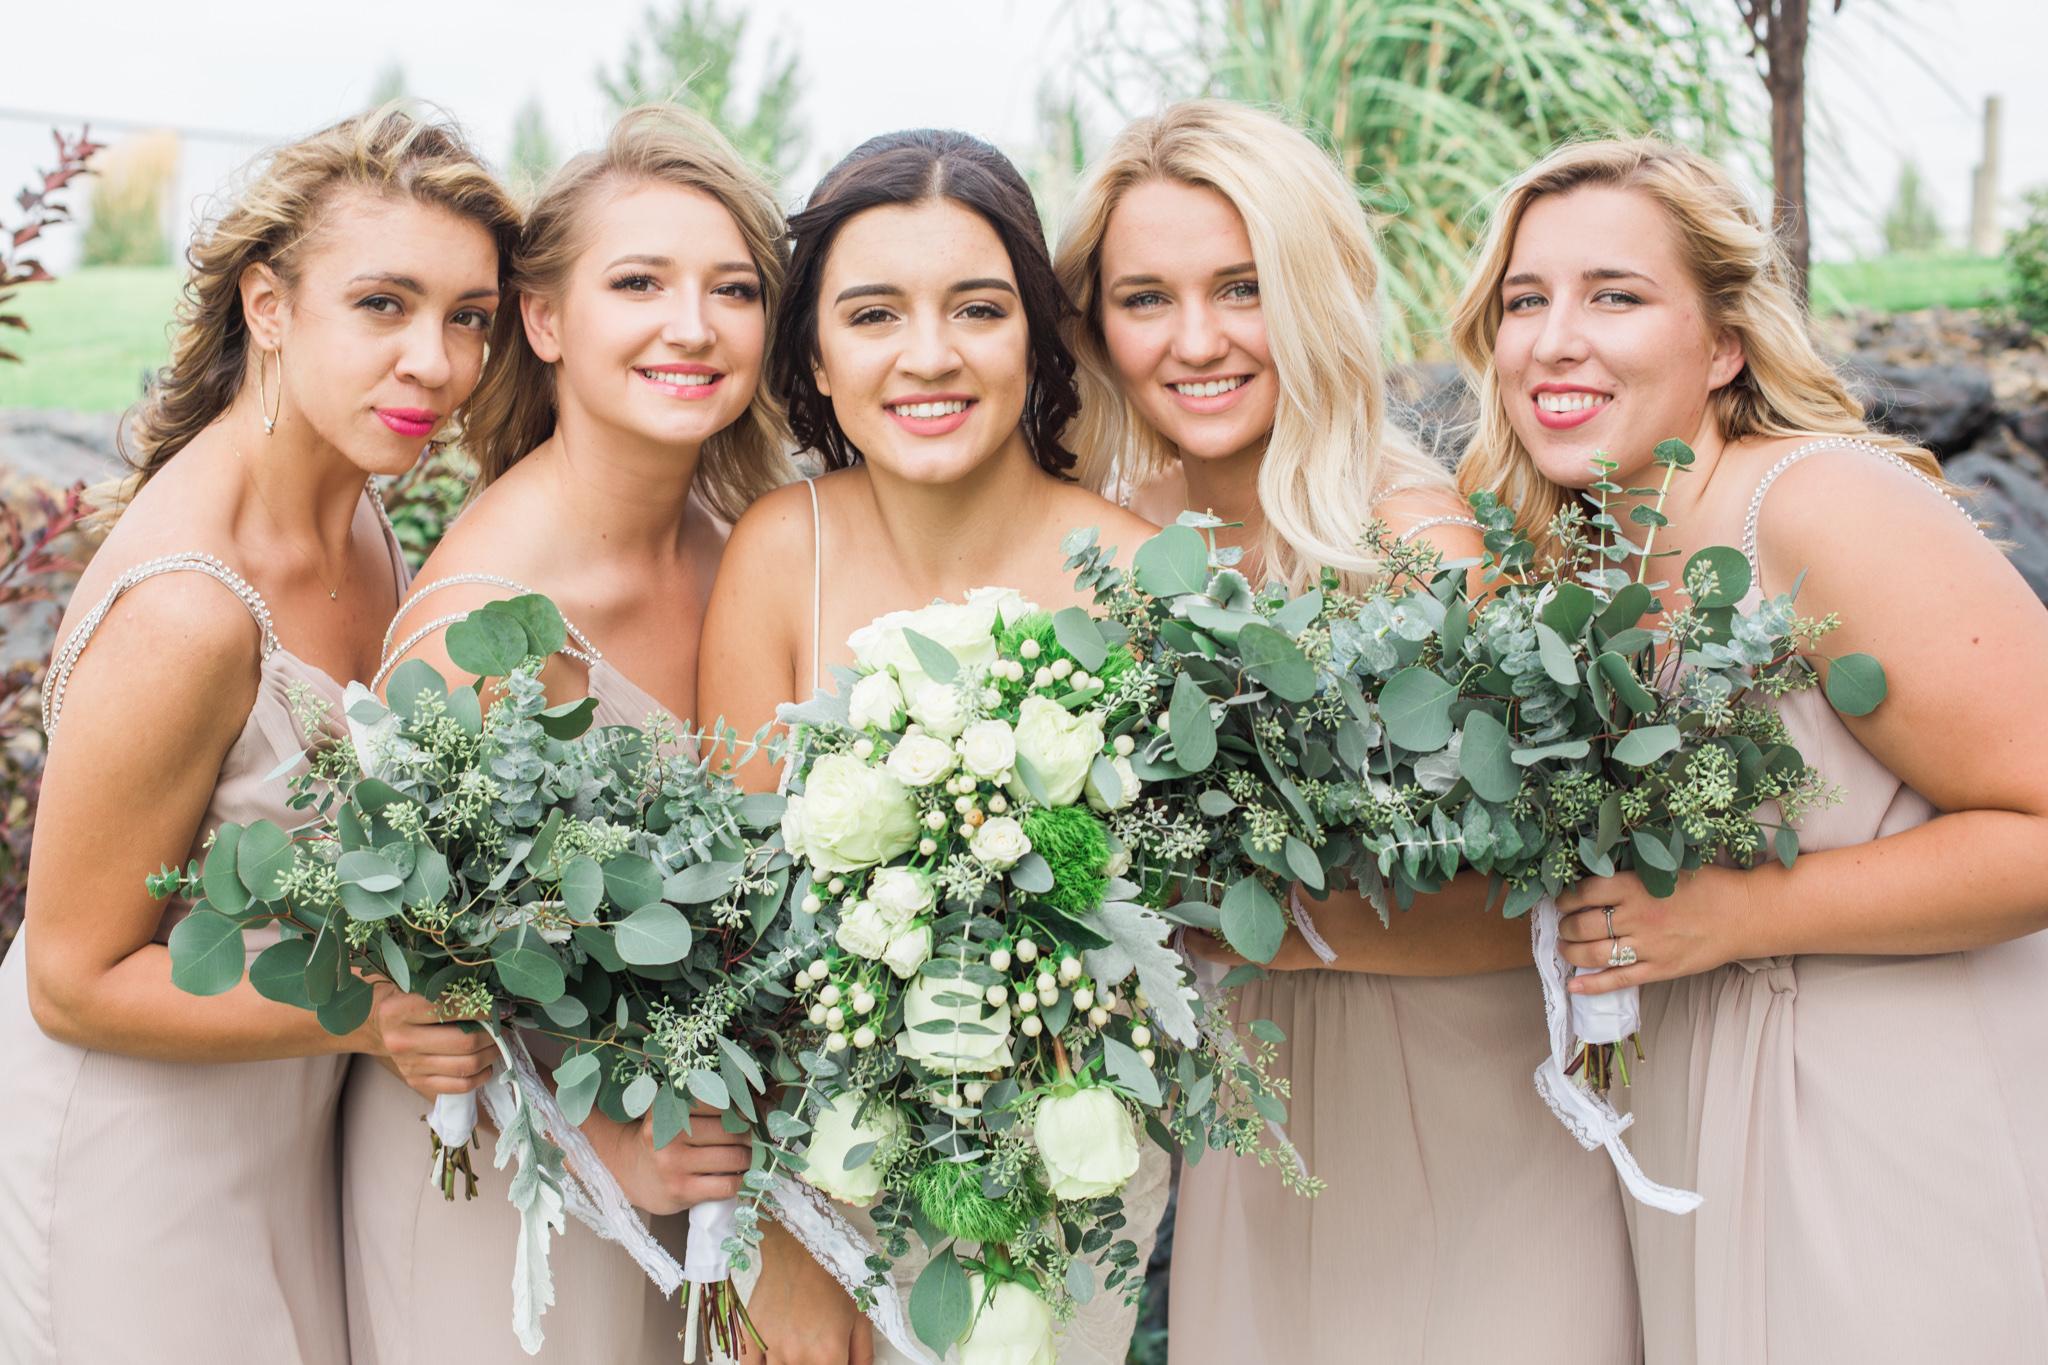 Olga_janni_wedding_090917_WEBSIZE (222 of 704).JPG